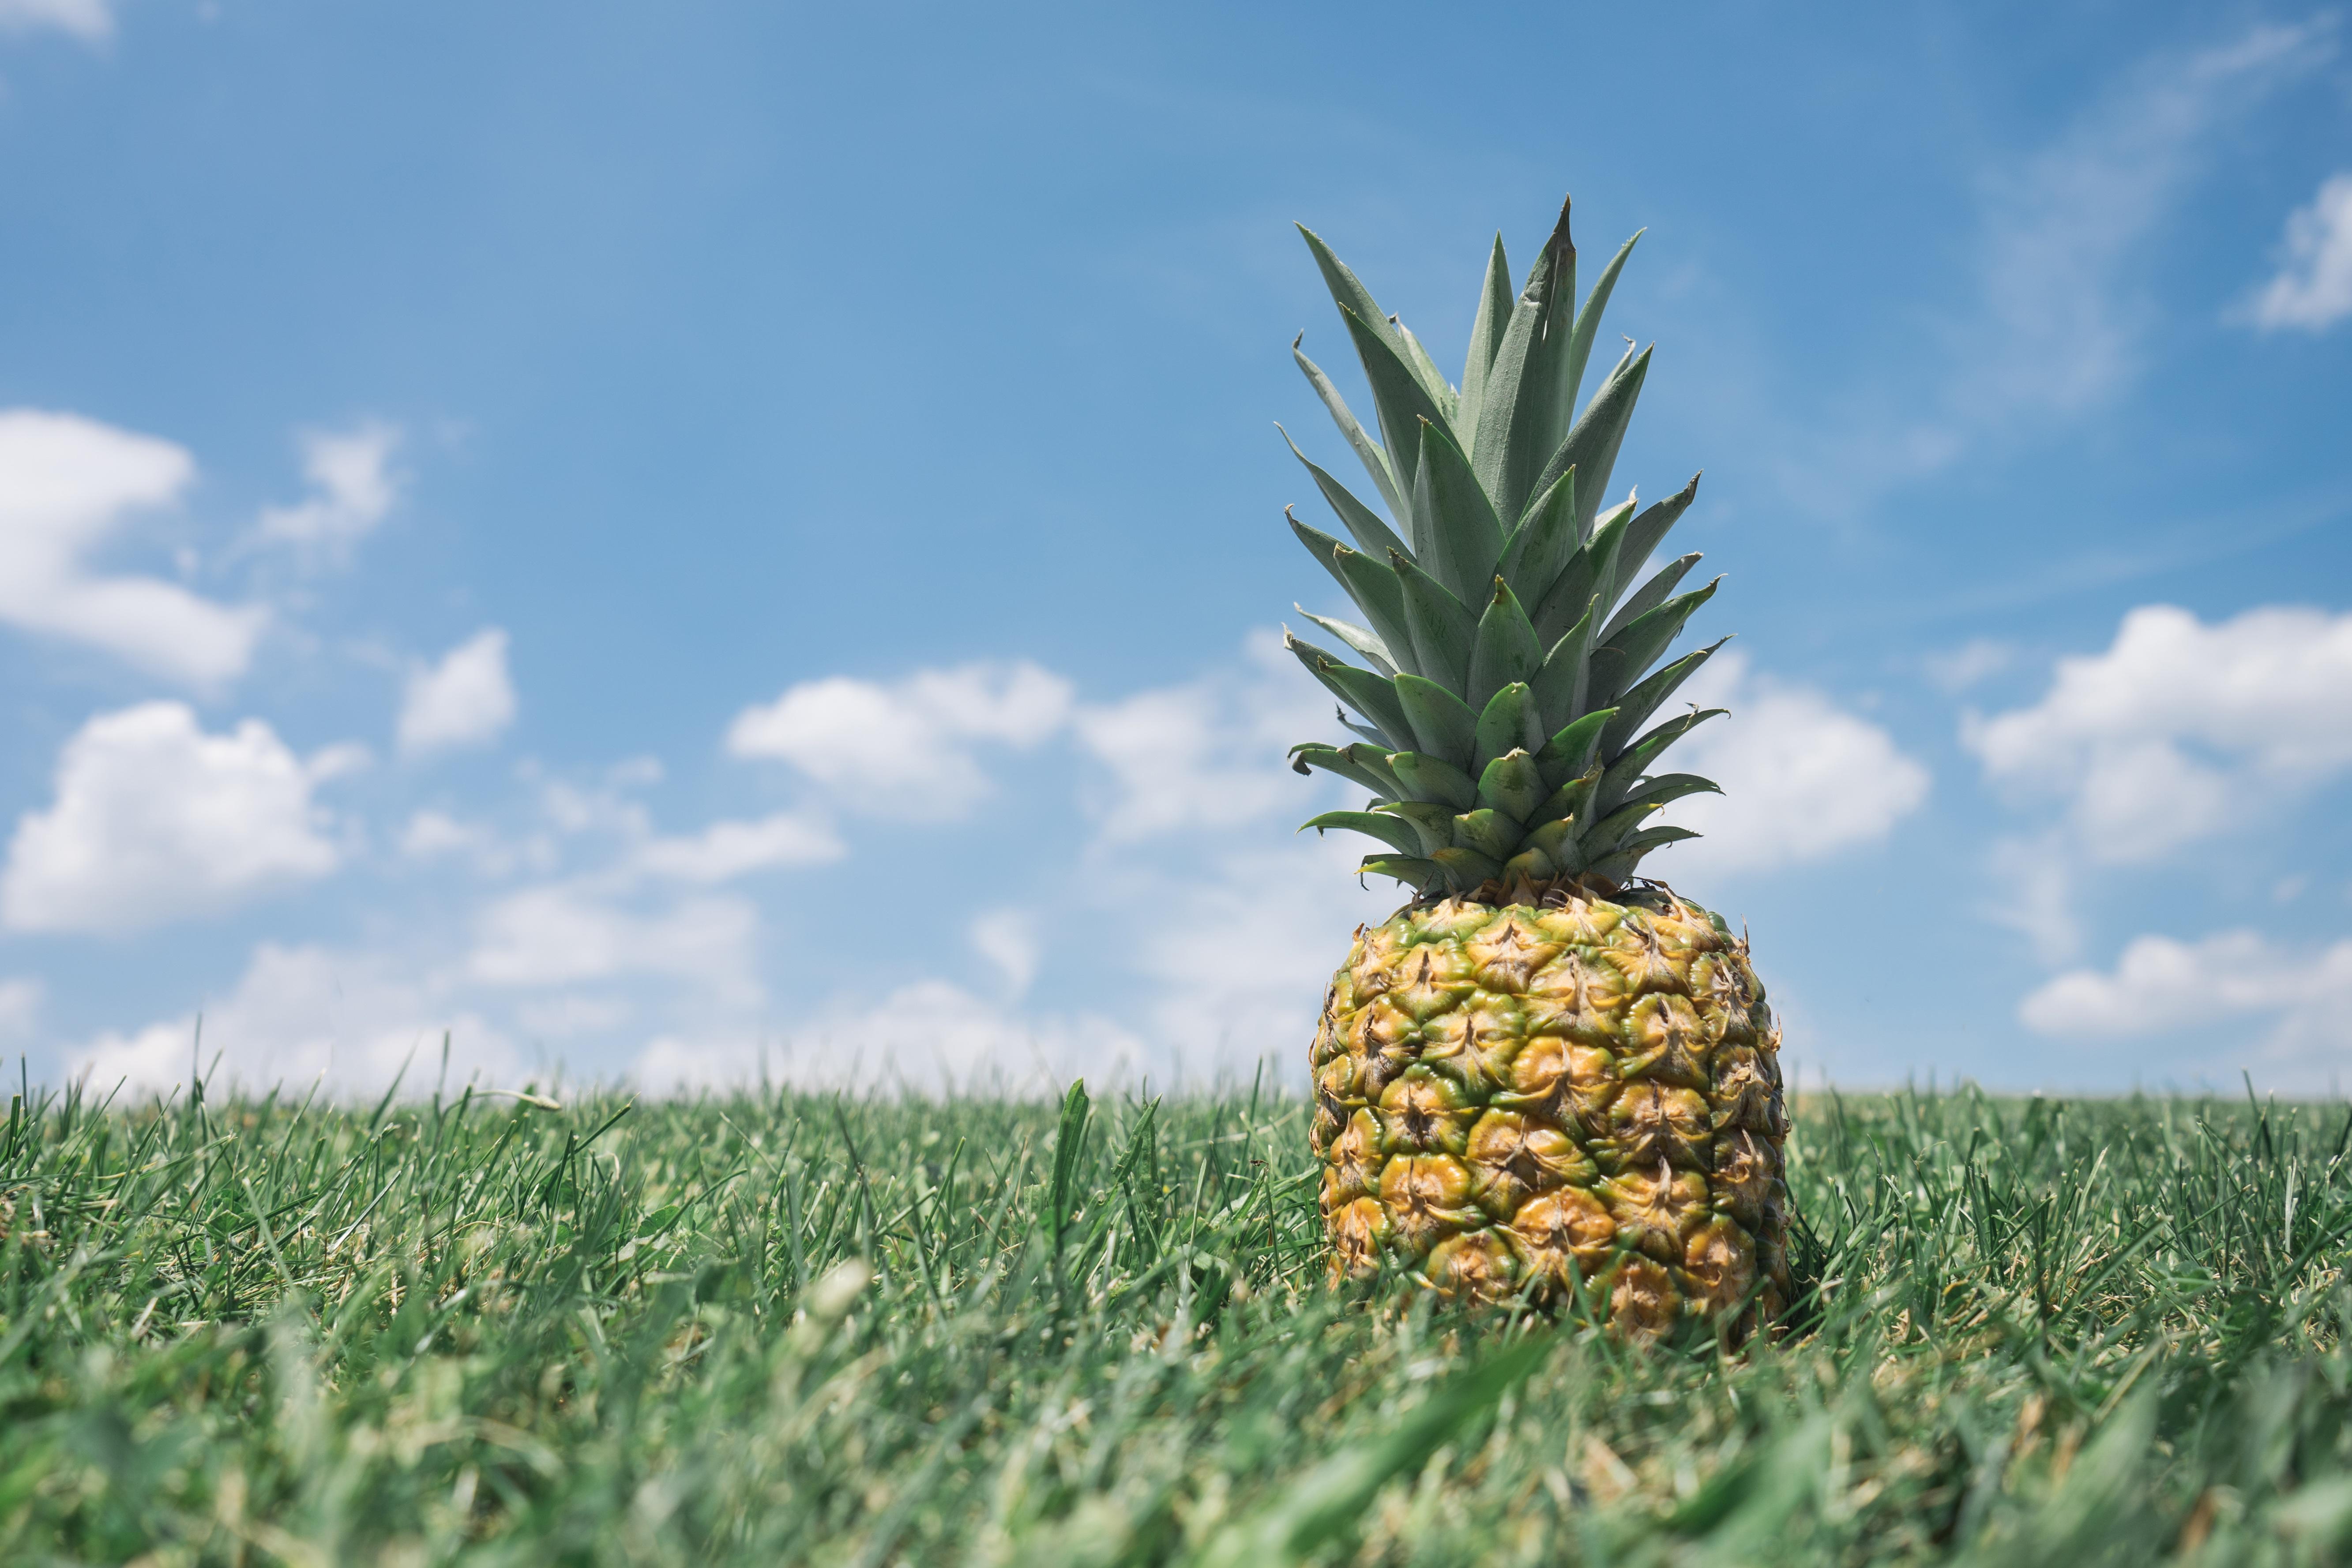 A pineapple in a field